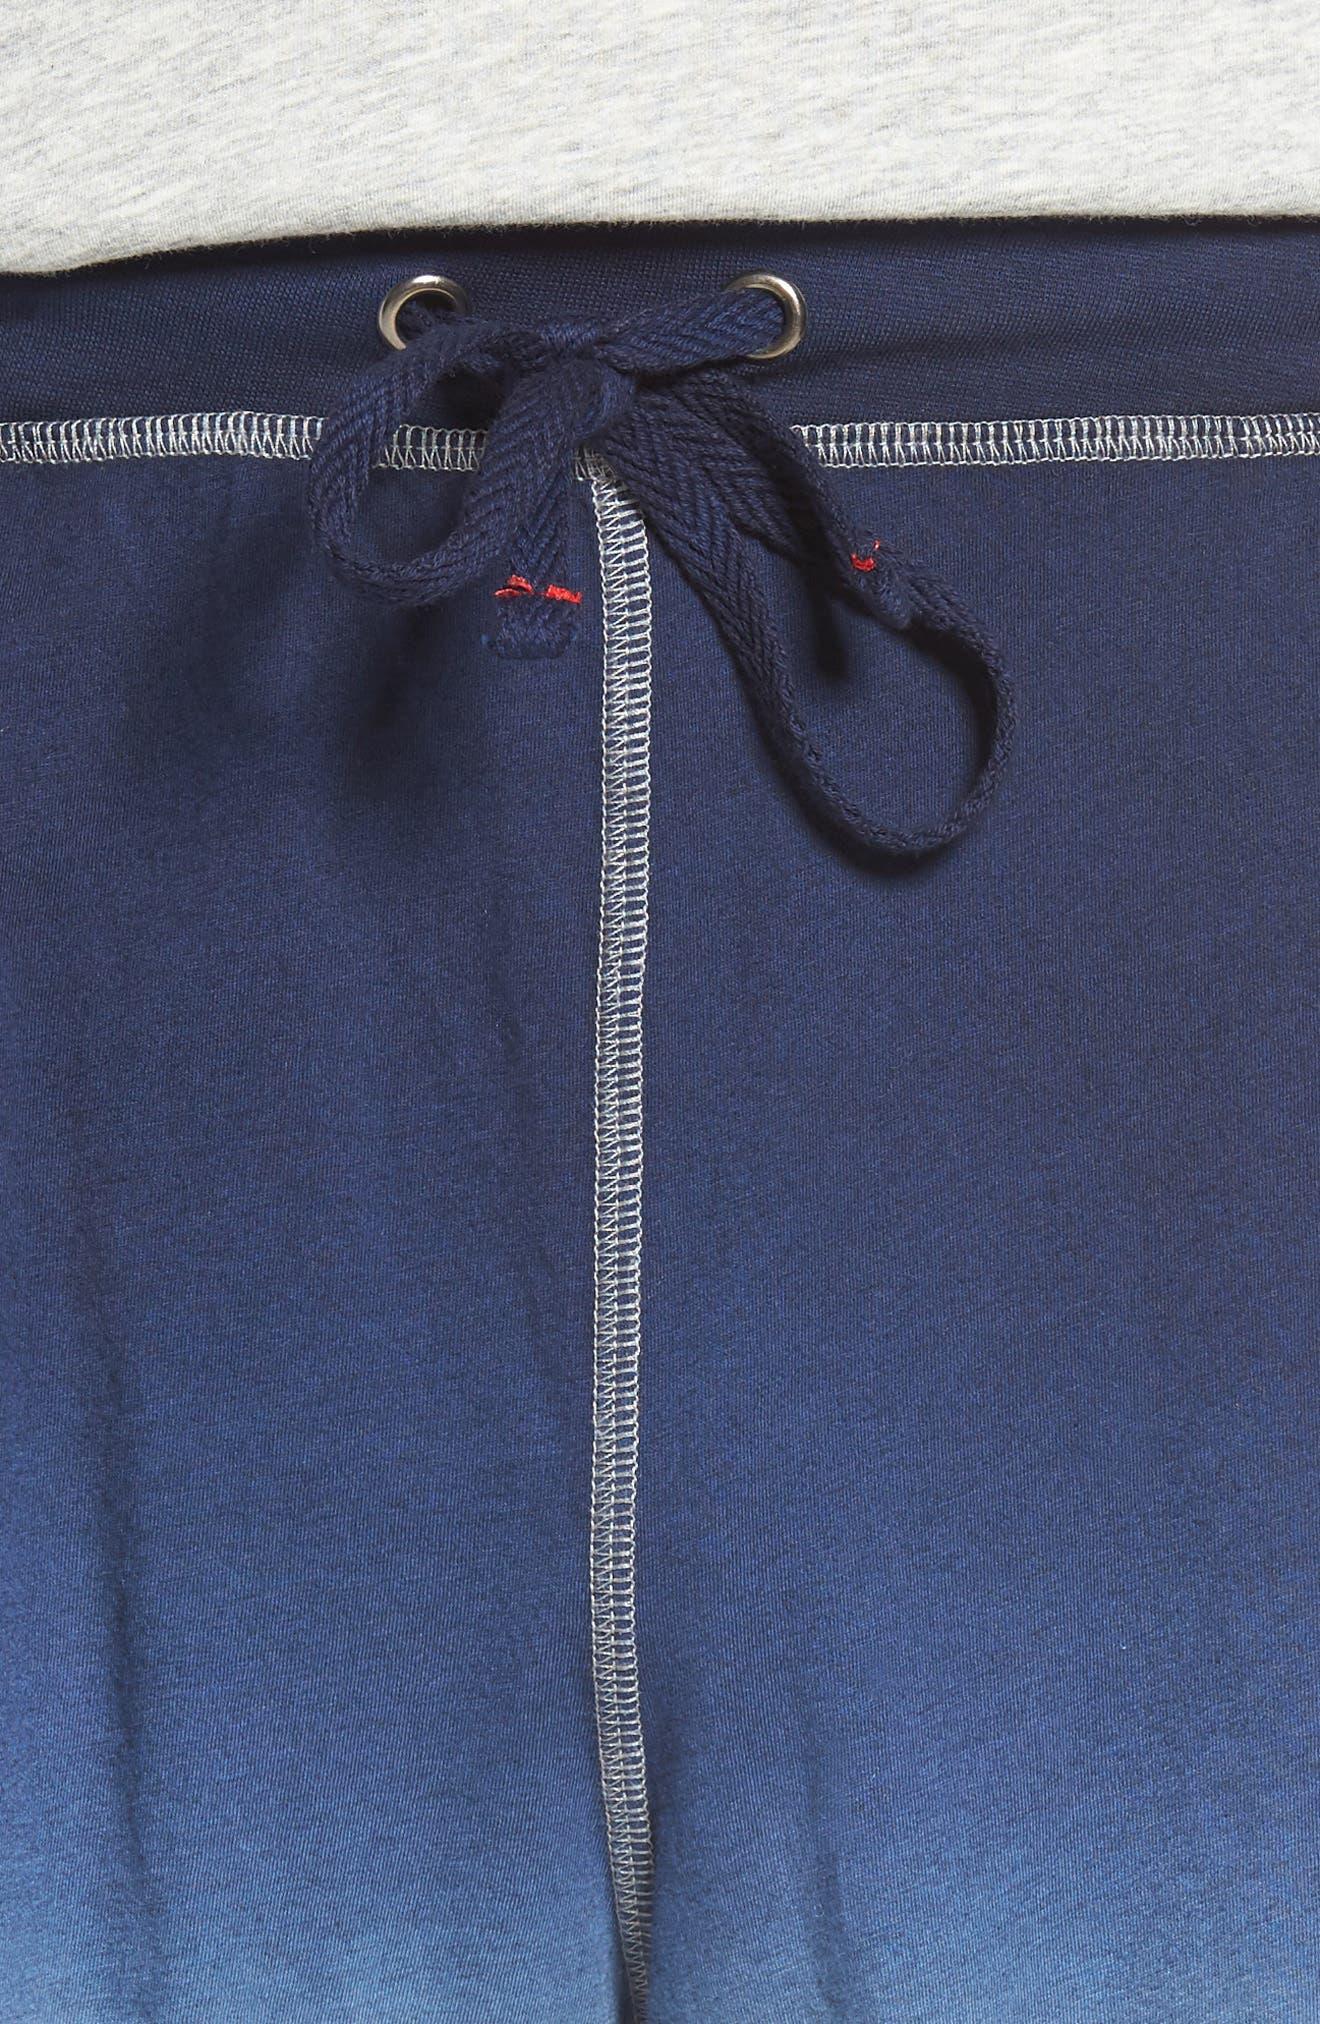 Dip Dye Lounge Shorts,                             Alternate thumbnail 4, color,                             410